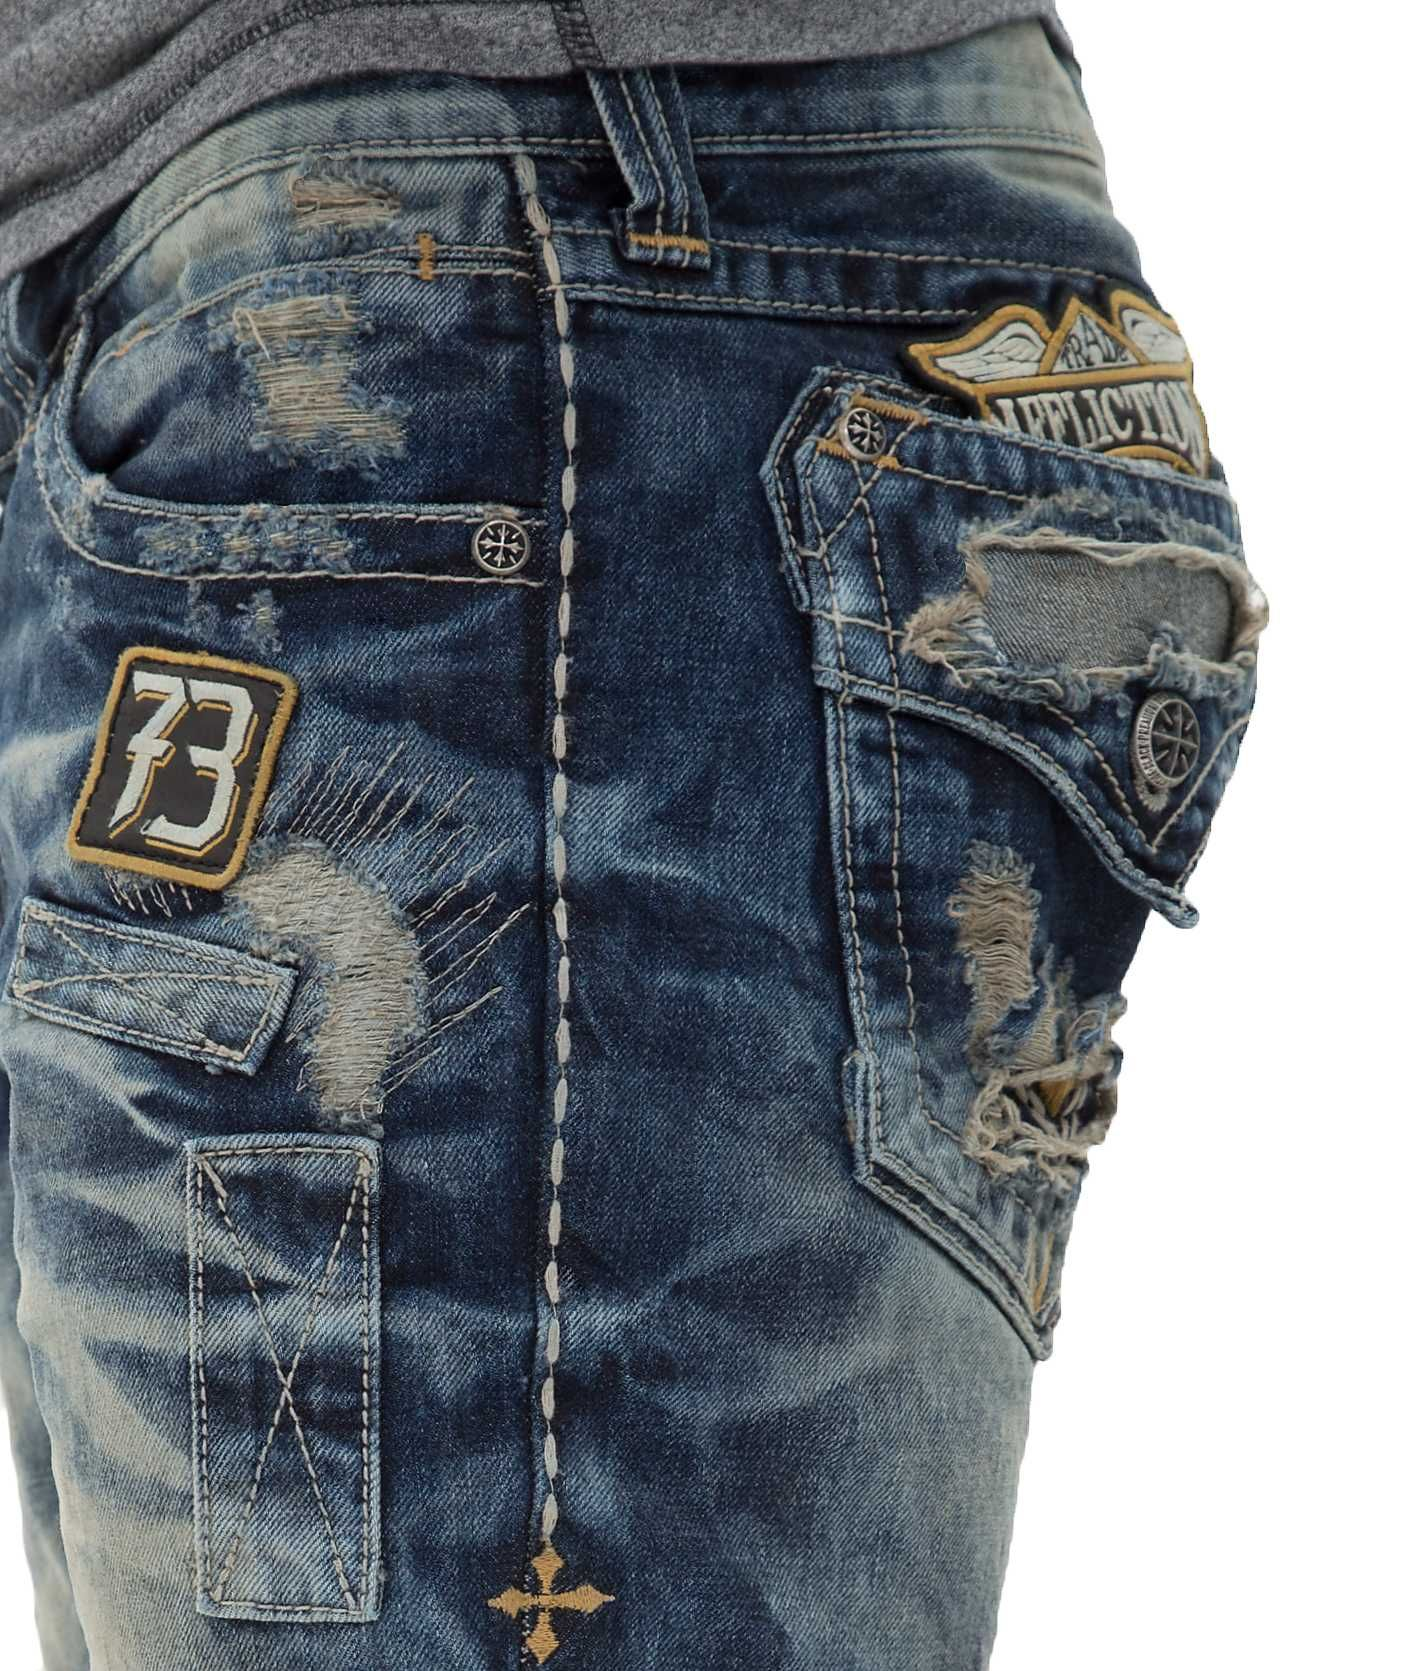 Affliction Black Premium Blake Jean Affliction Clothing Mens Fashion Jeans Denim Jacket Men [ 1671 x 1425 Pixel ]